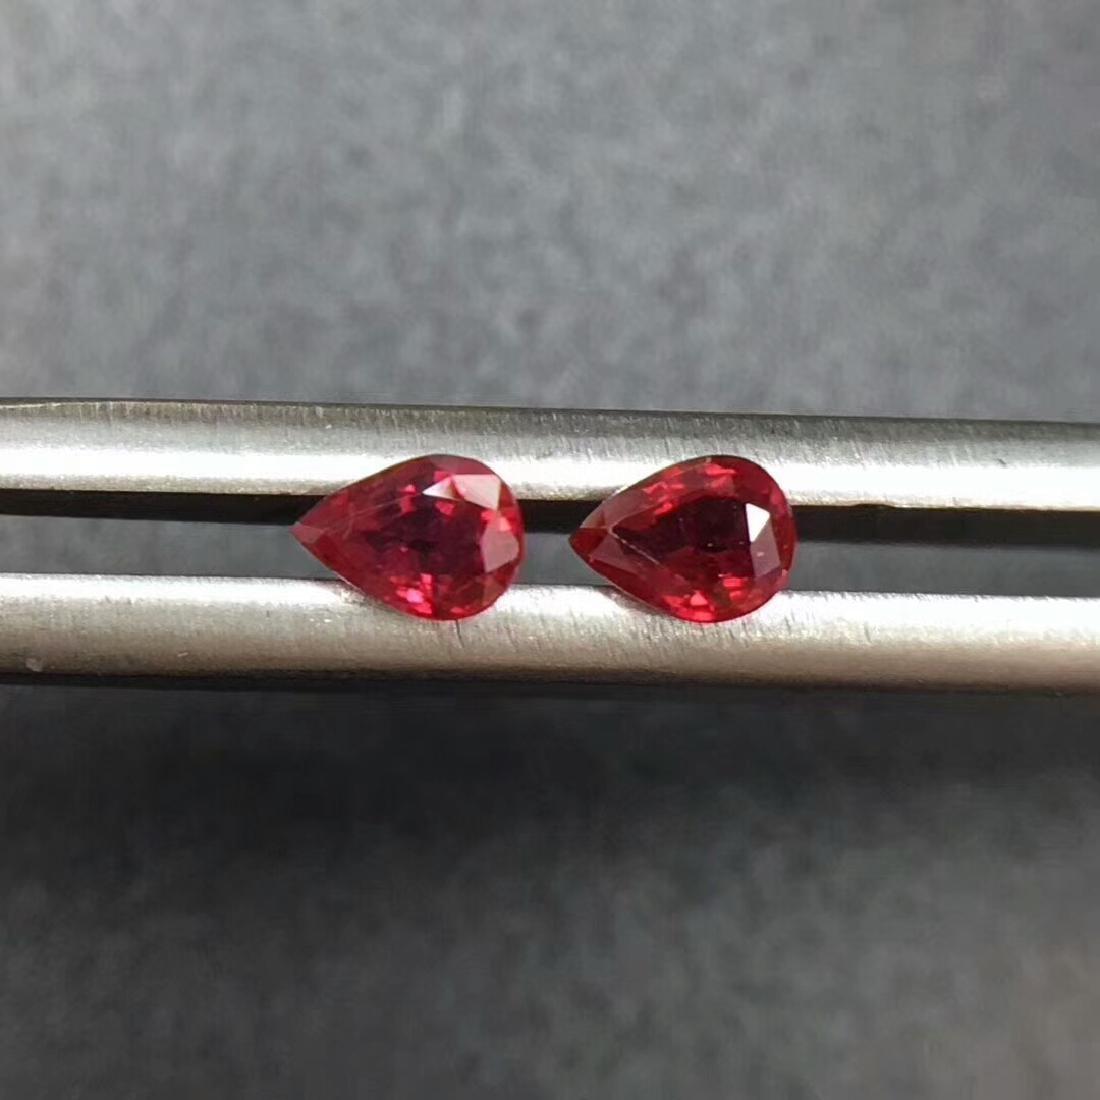 0.39 Ctw Natural 2 Loose Ruby Pear Earrings Set